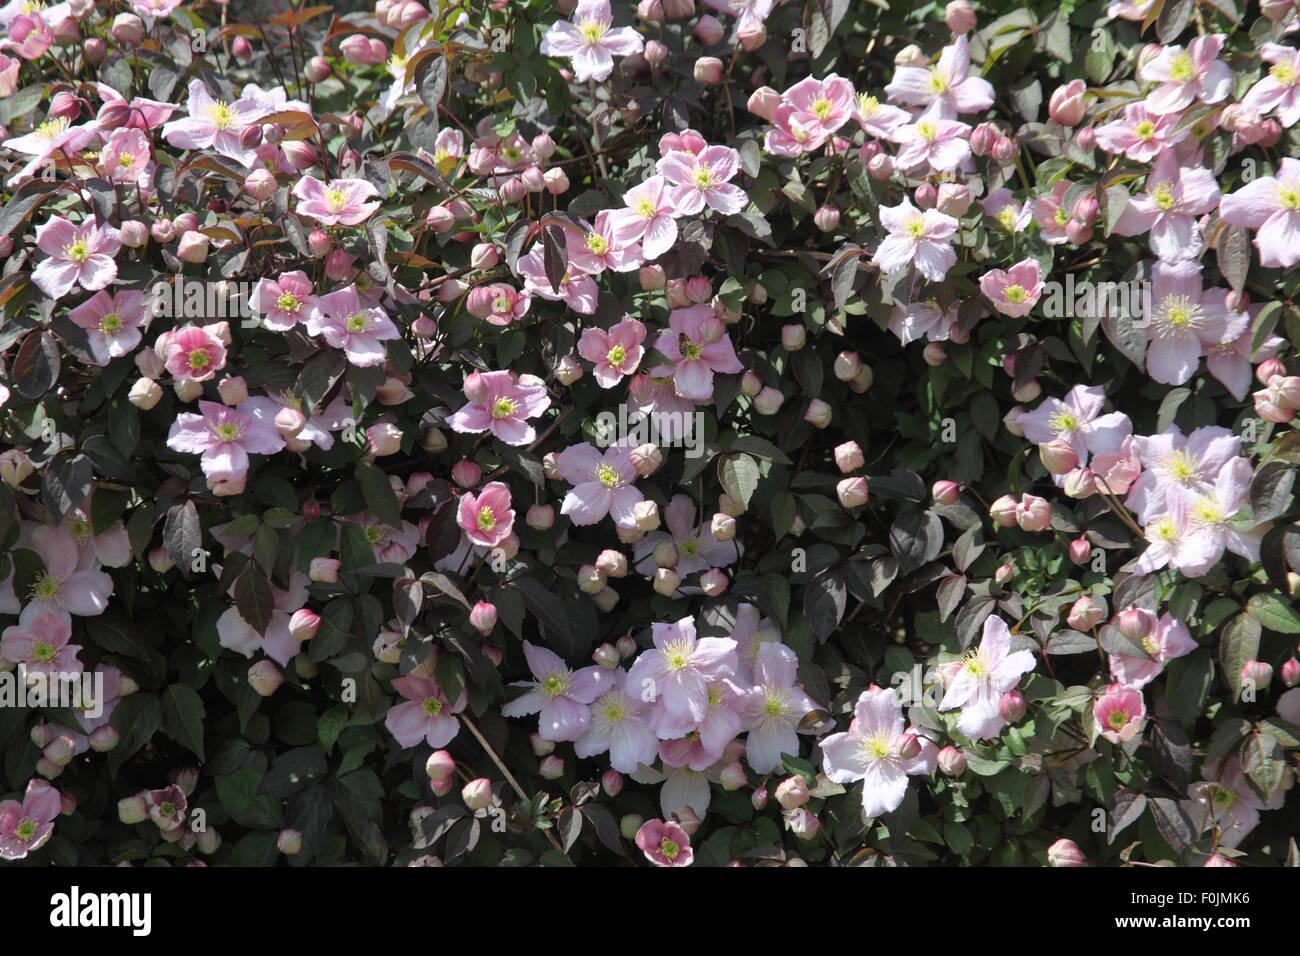 clematis montana var rubens 39 mayleen 39 plant in flower. Black Bedroom Furniture Sets. Home Design Ideas